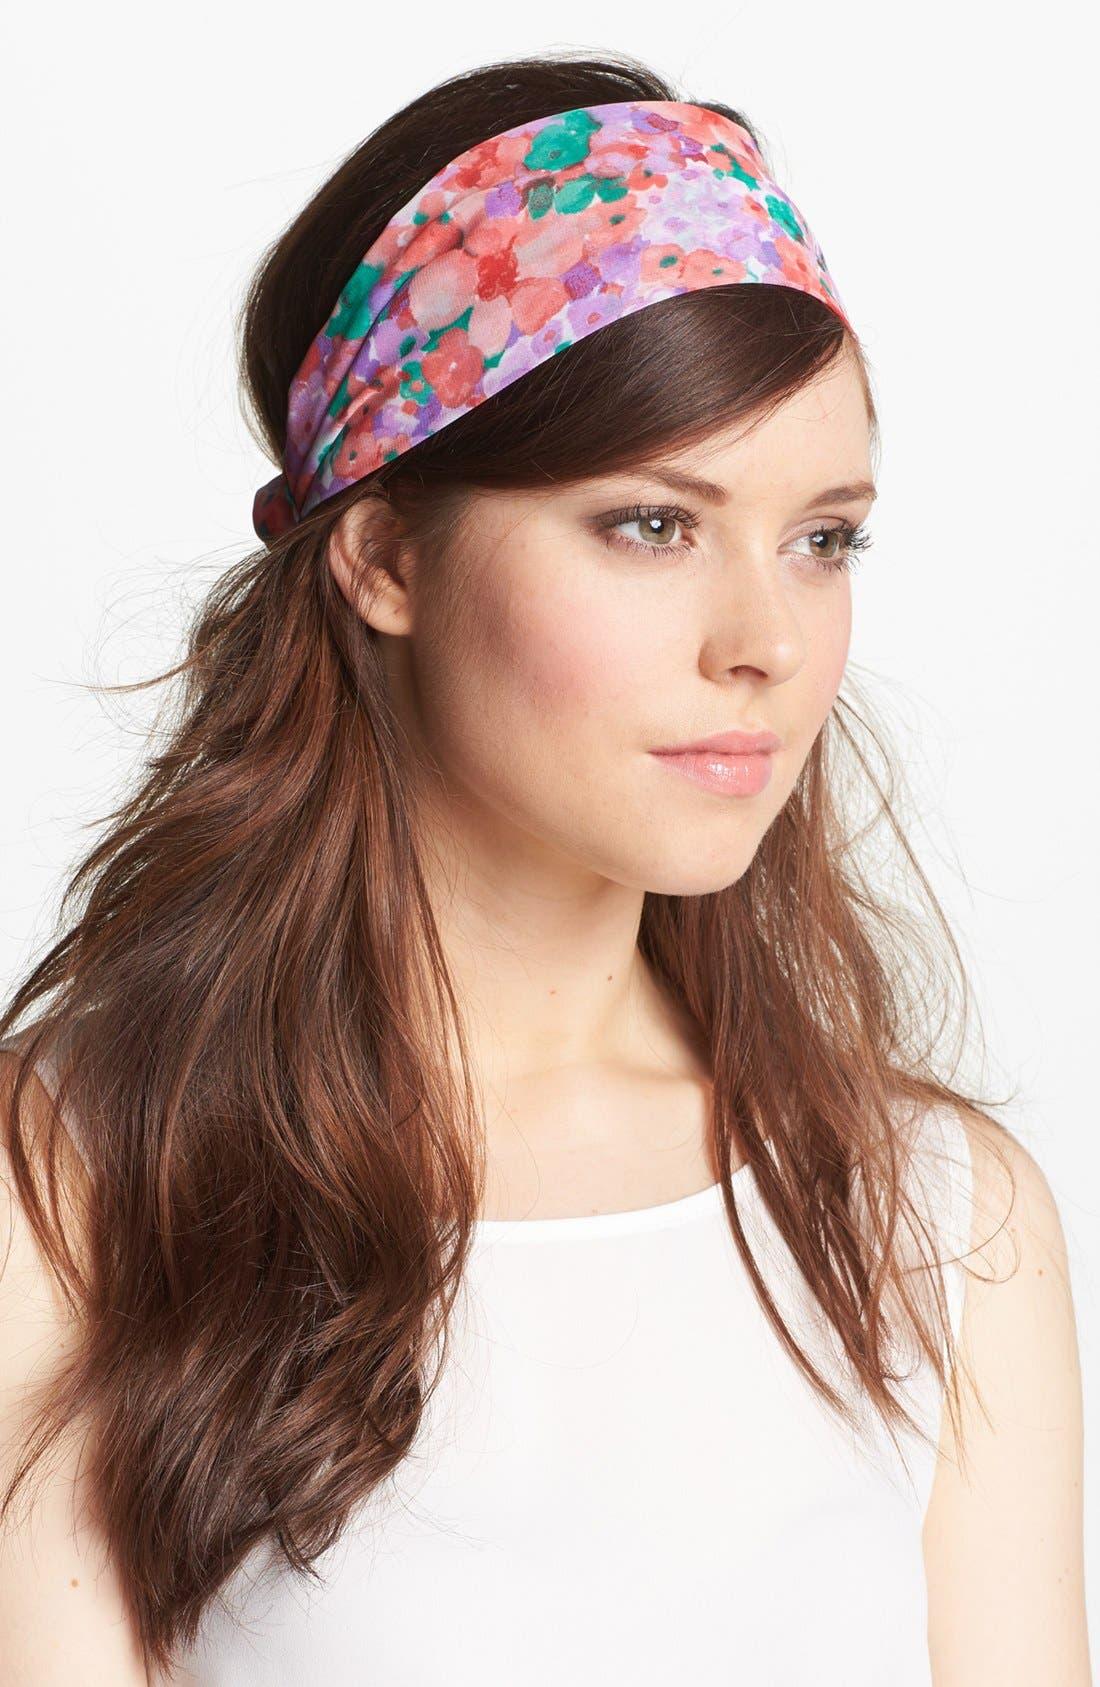 Main Image - Tasha 'Frolicking Floral' Head Wrap